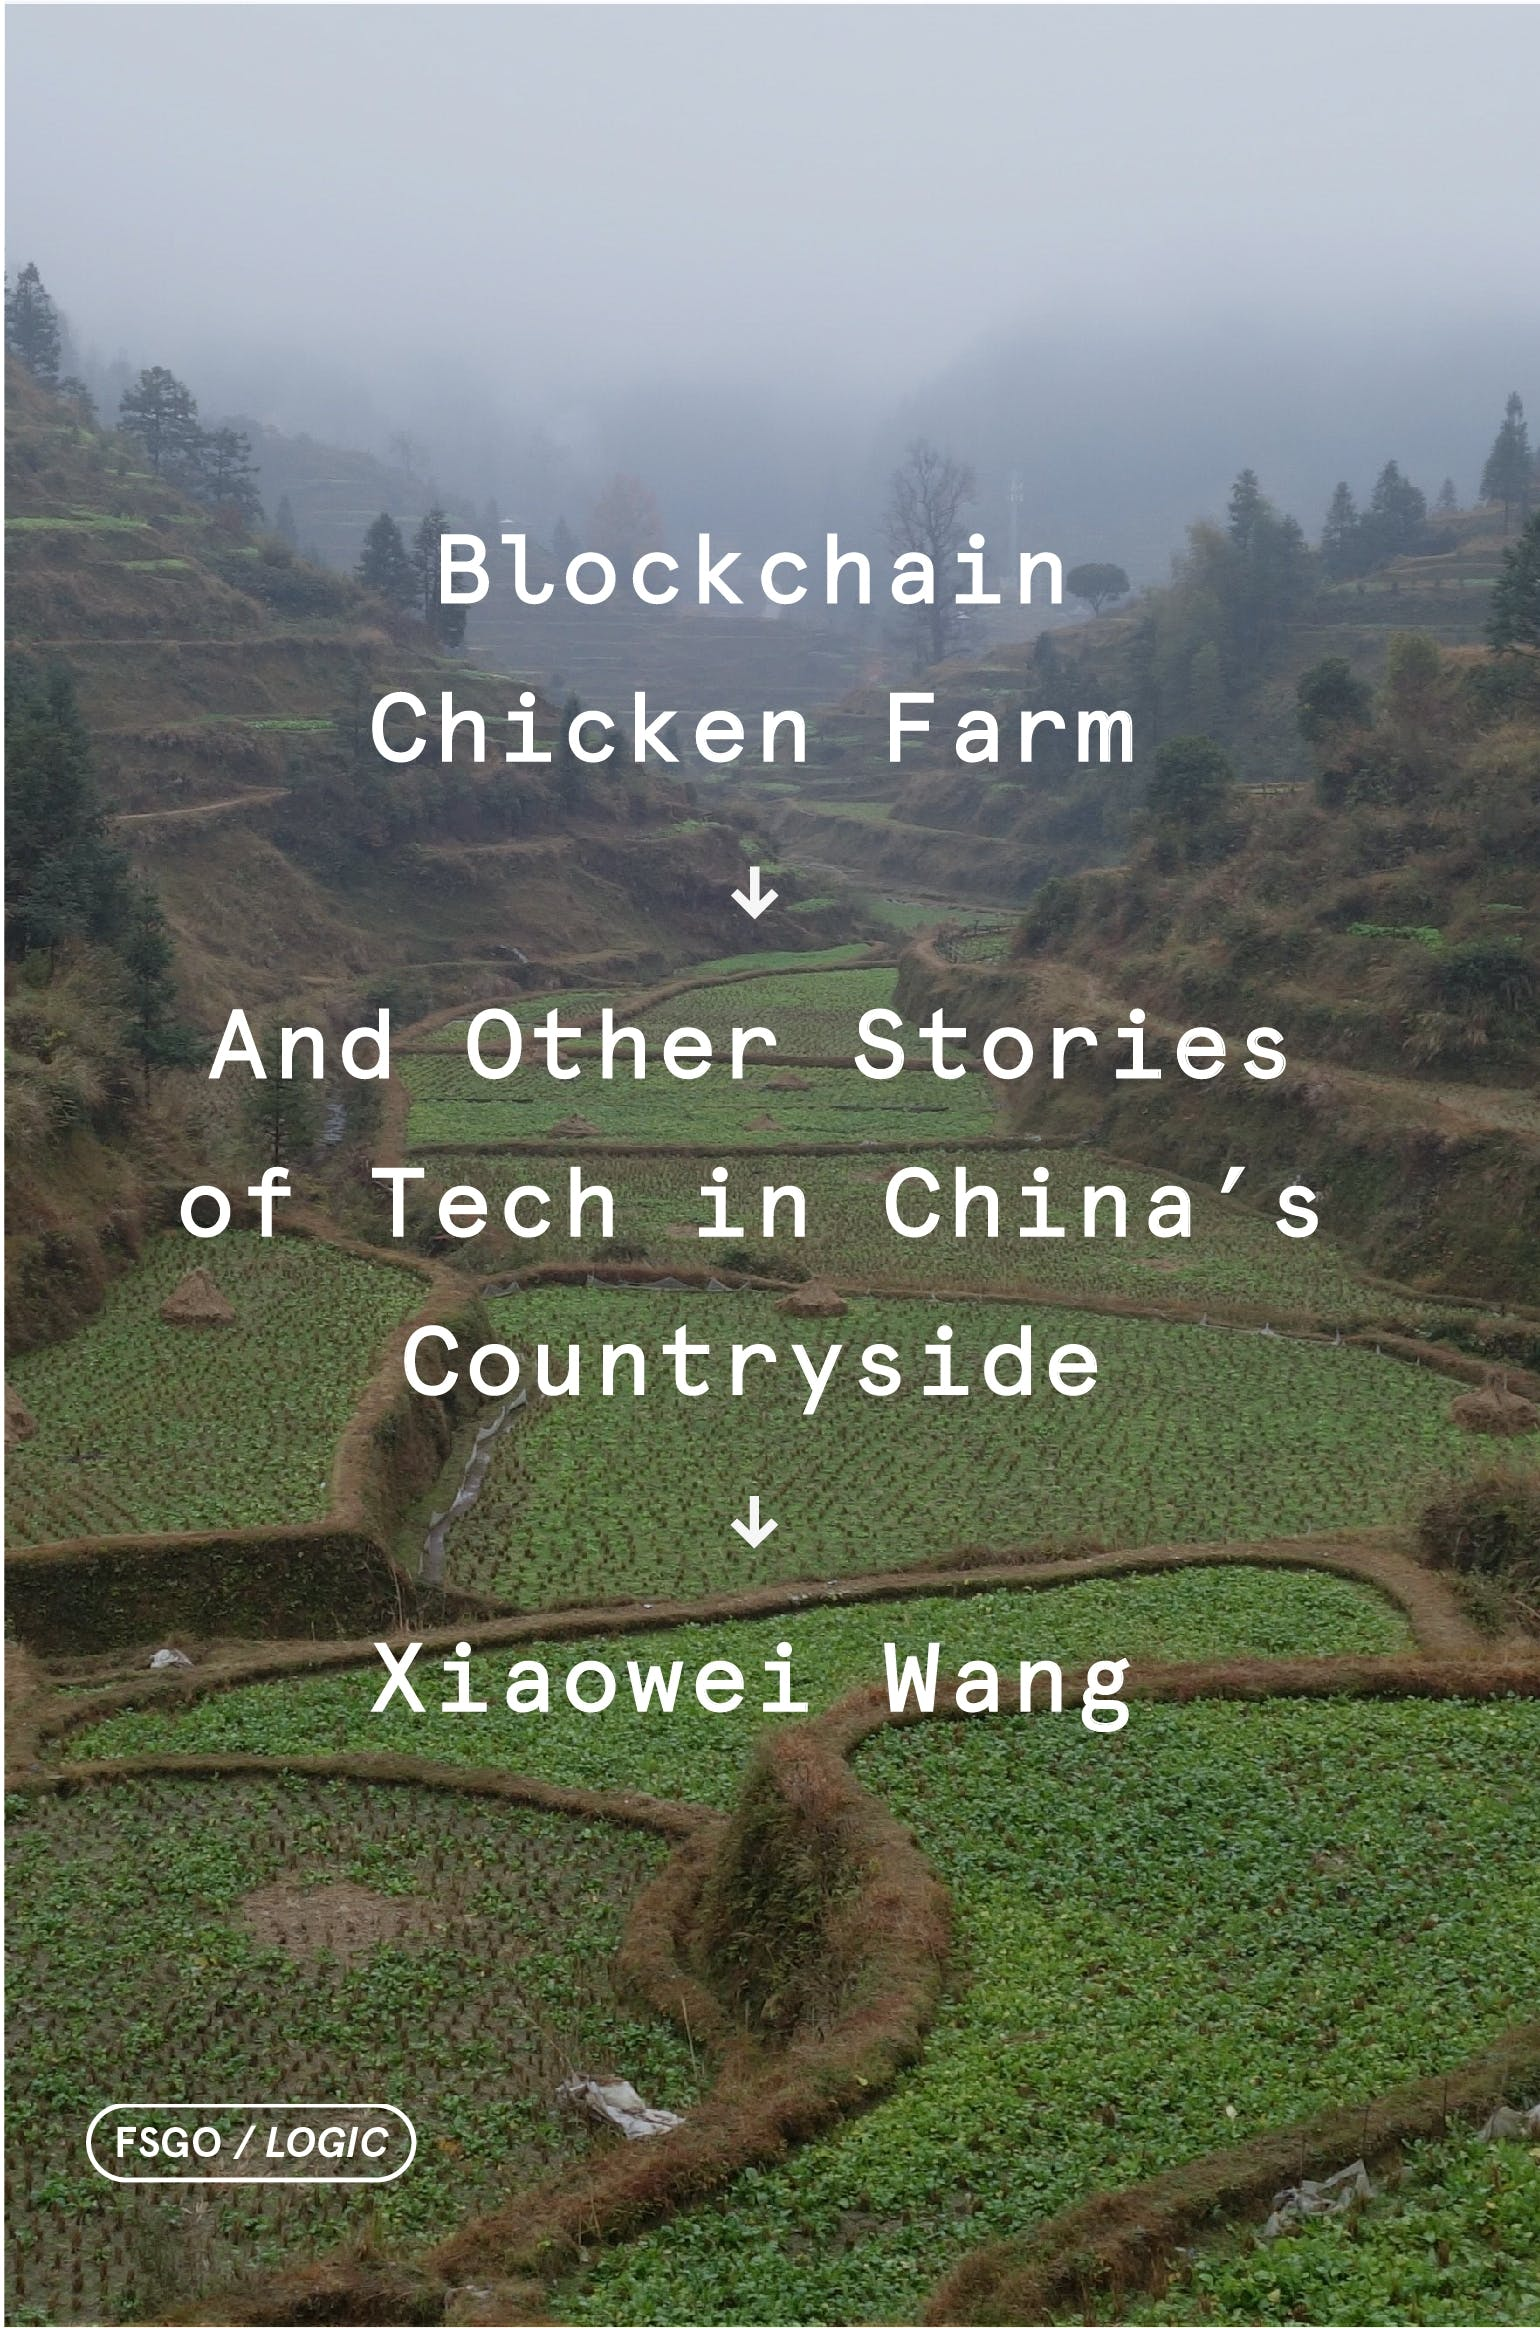 Image of Blockchain Chicken Farm